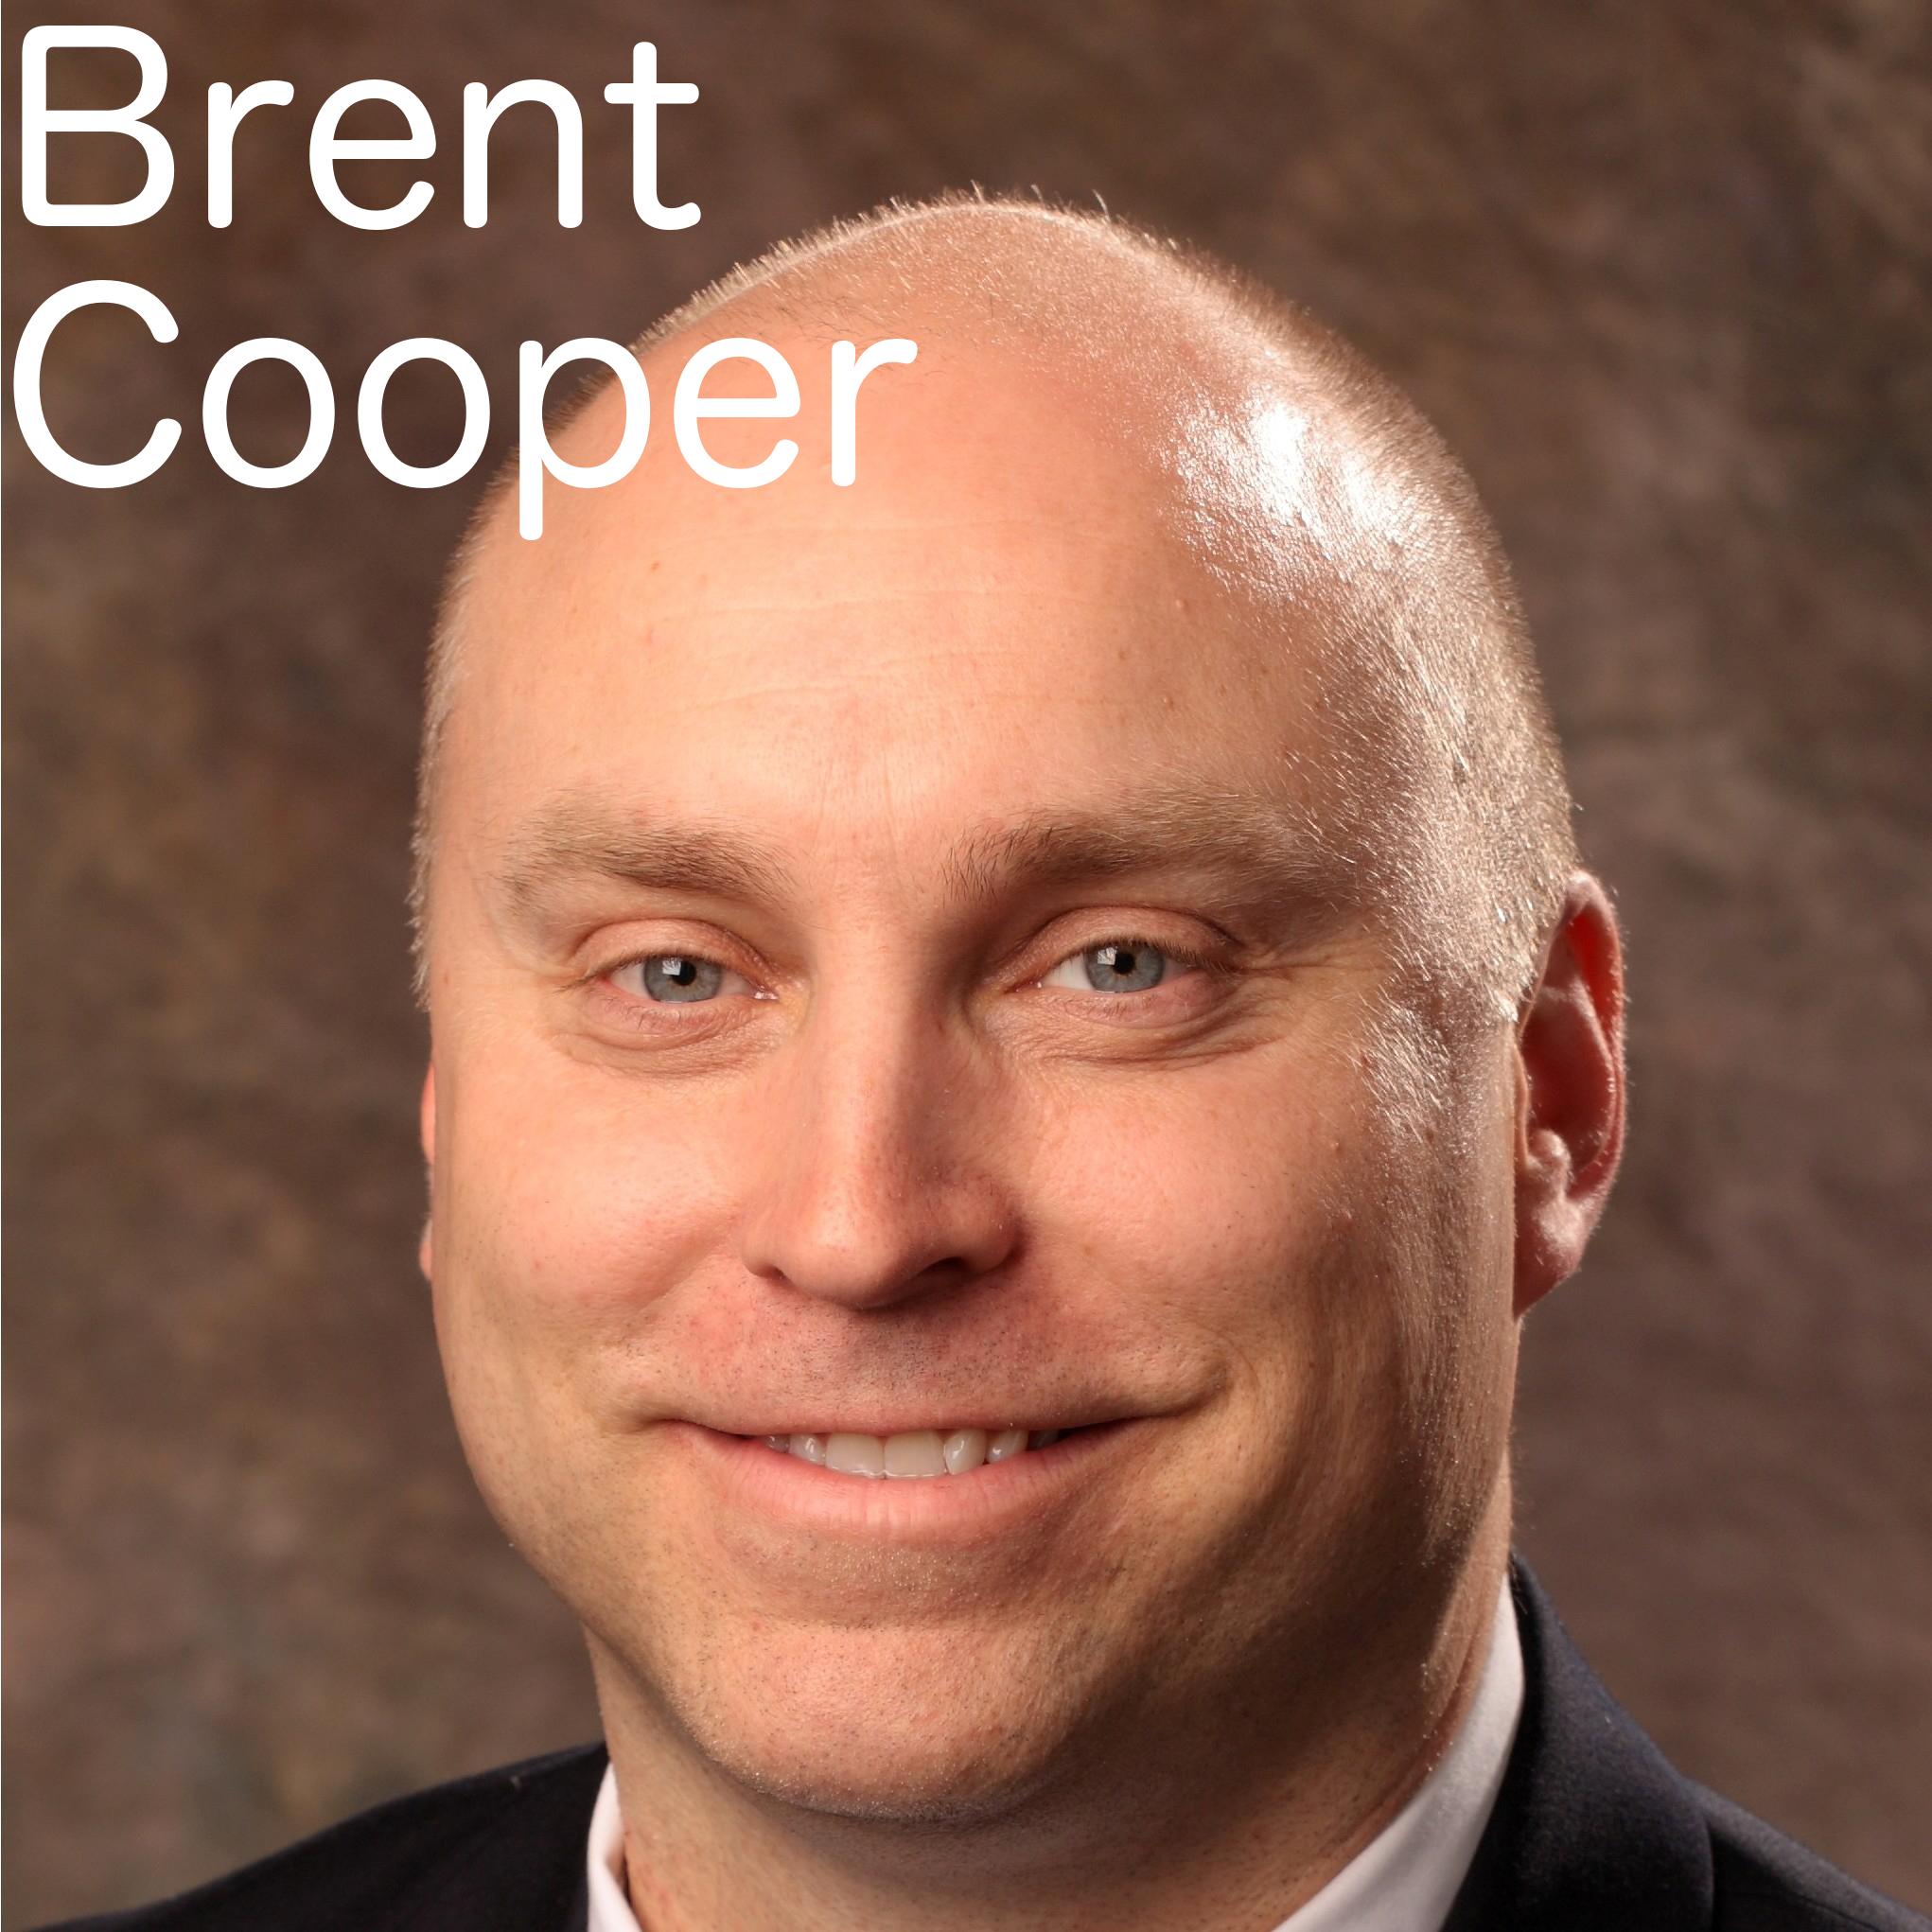 Brent Cooper